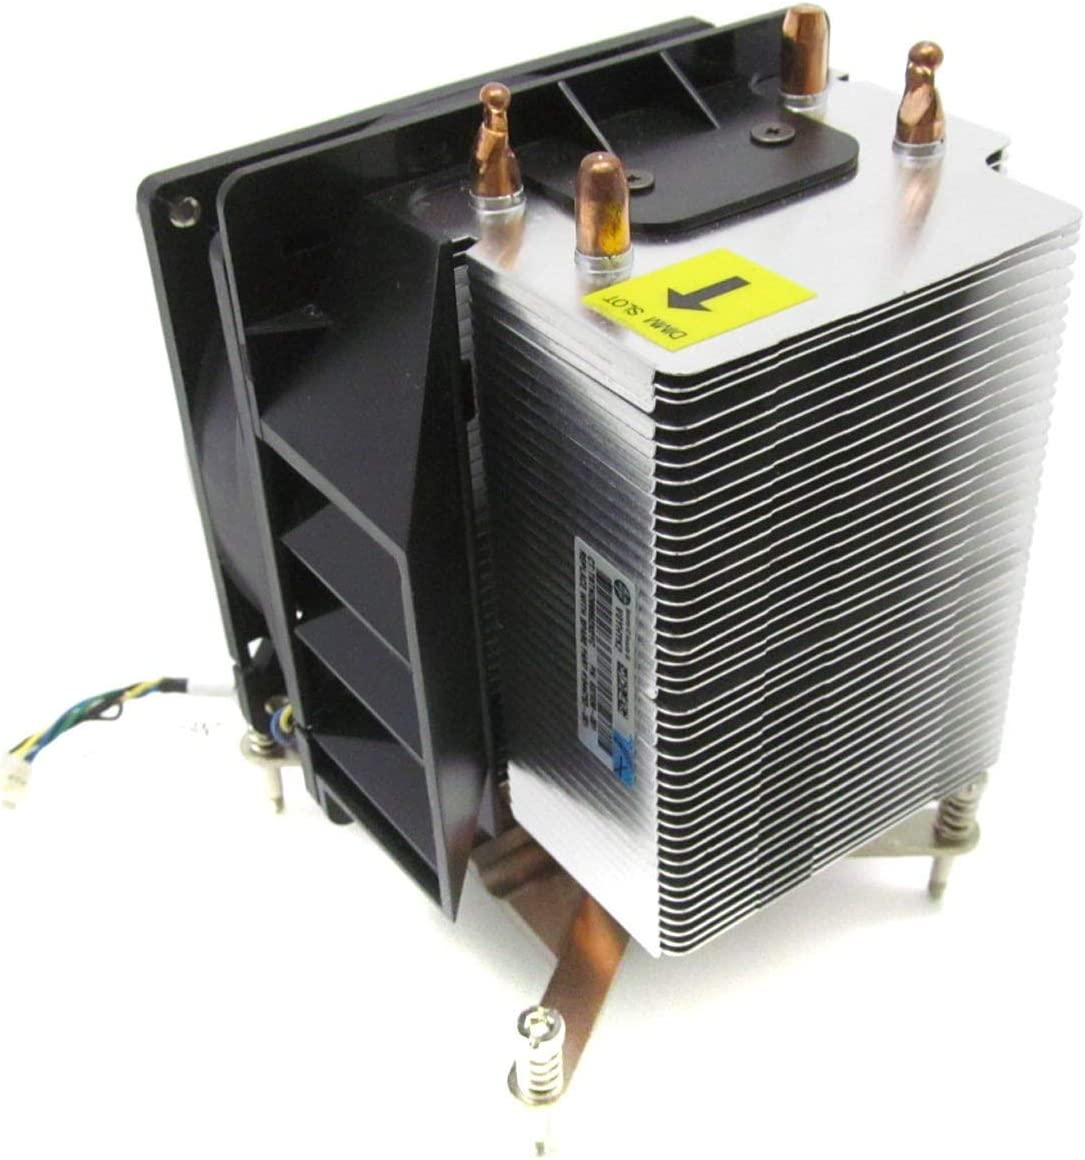 Renewed HP 644750-001 Heatsink 4U Form Factor